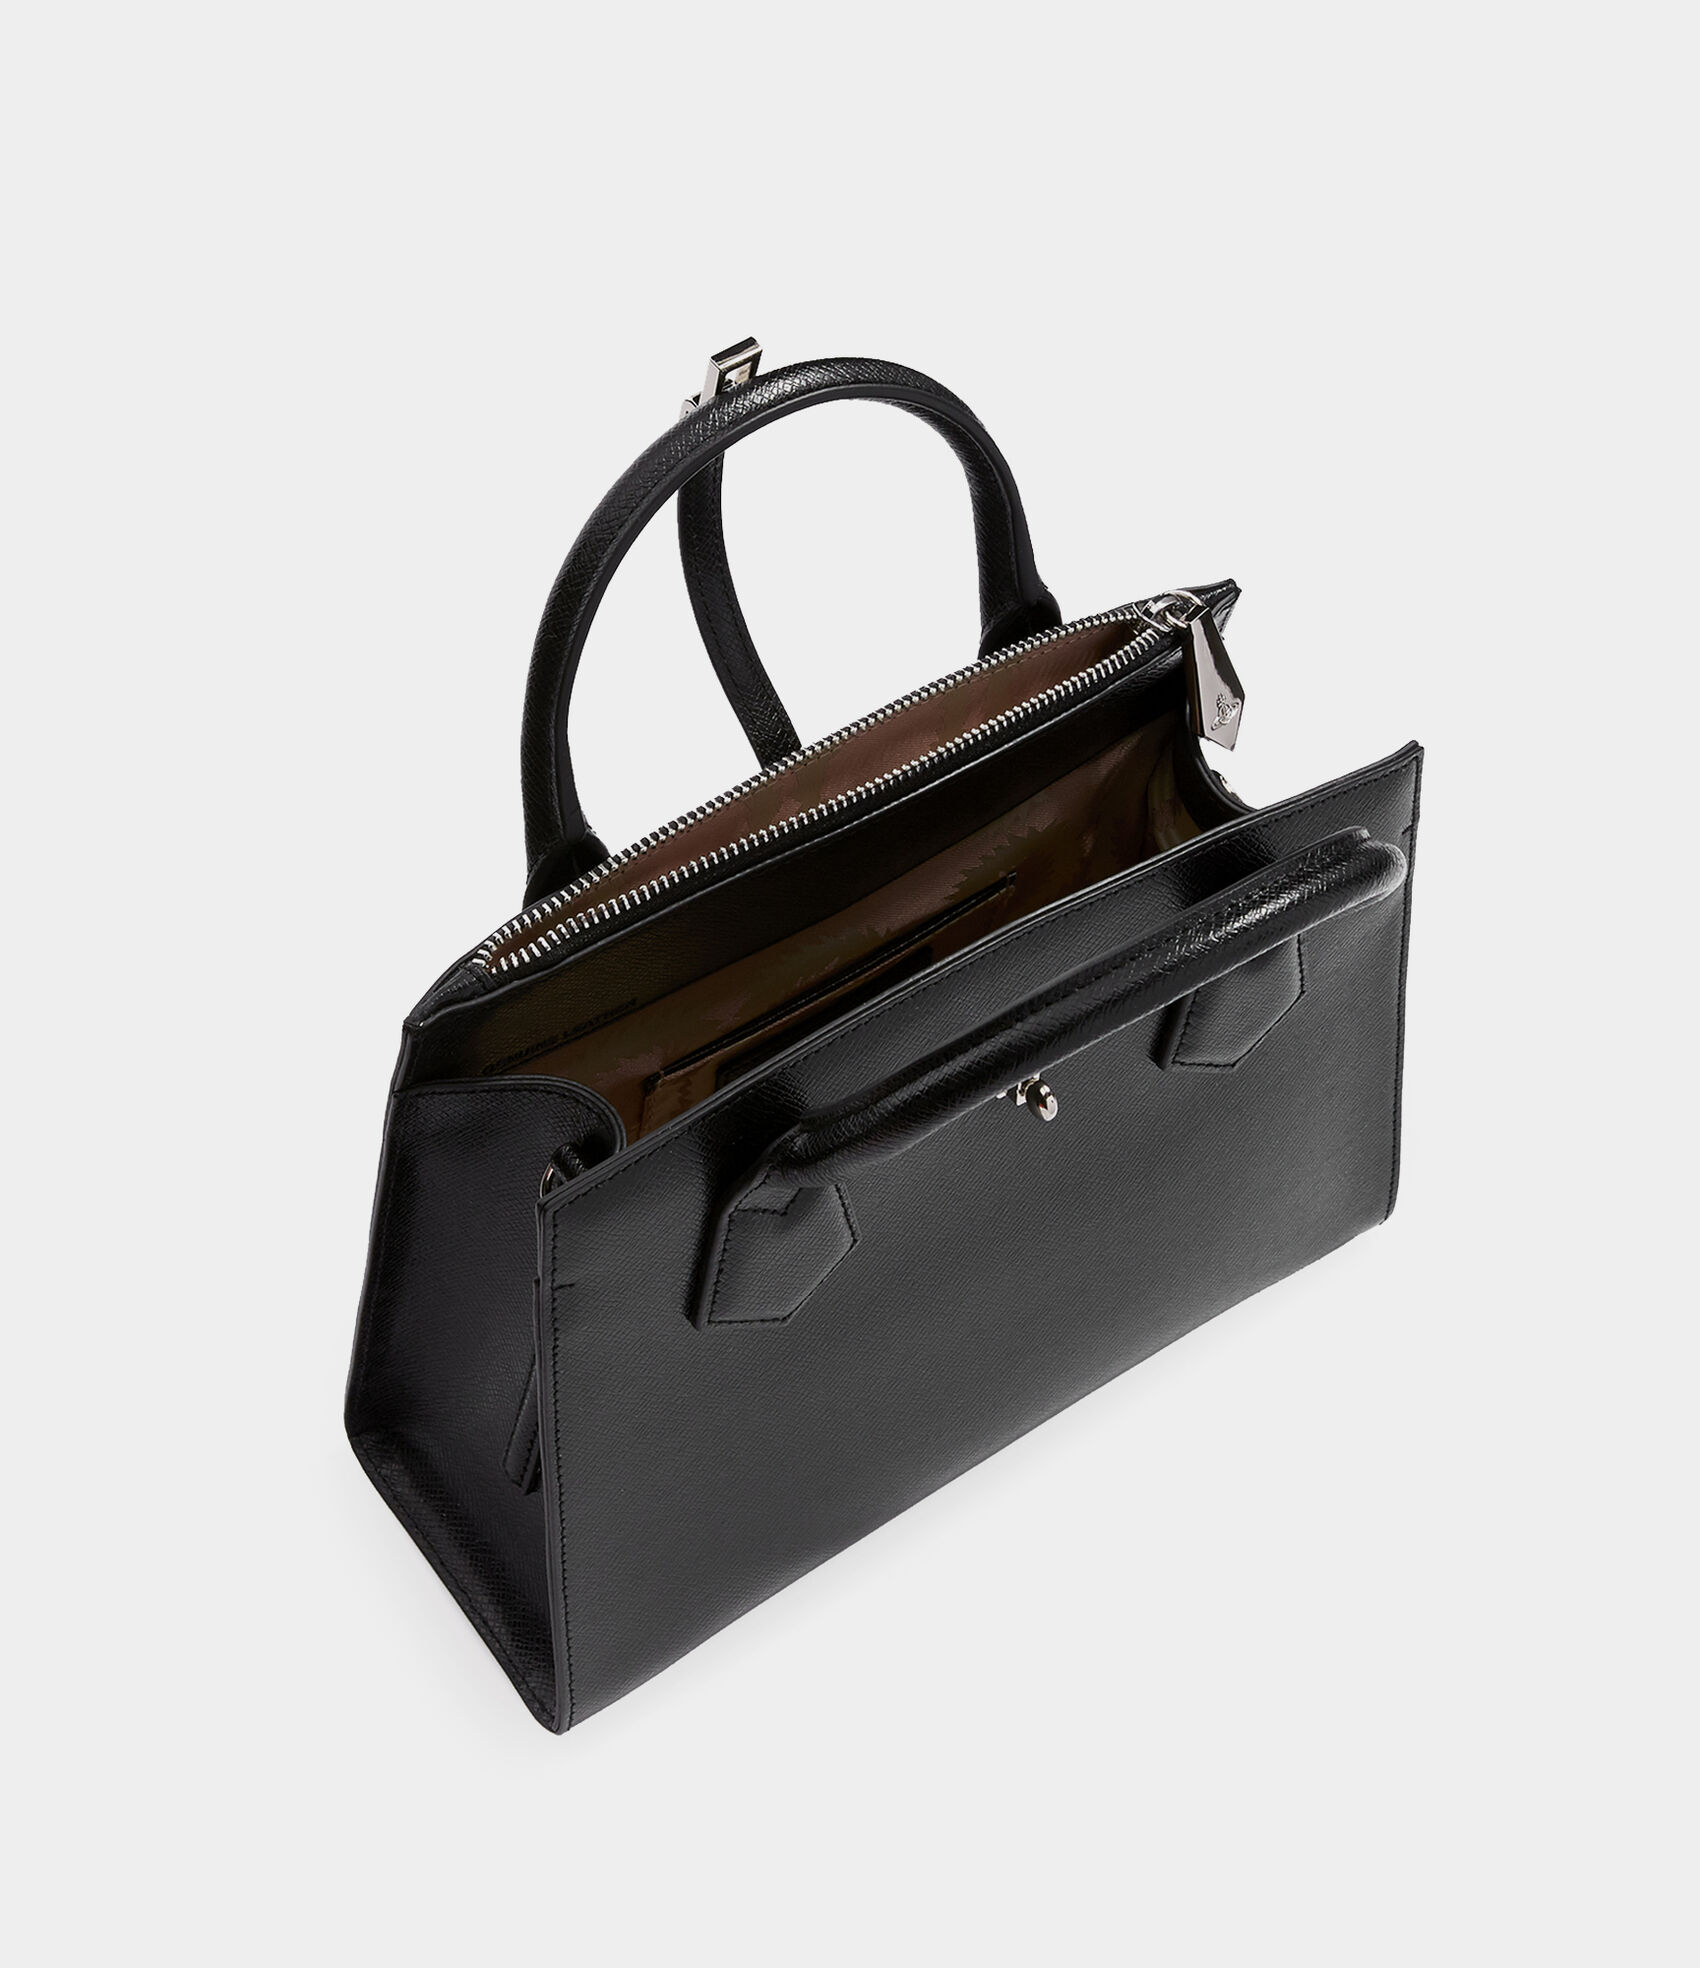 Vivienne Westwood Women s Designer Handbags  a846b34f758c6